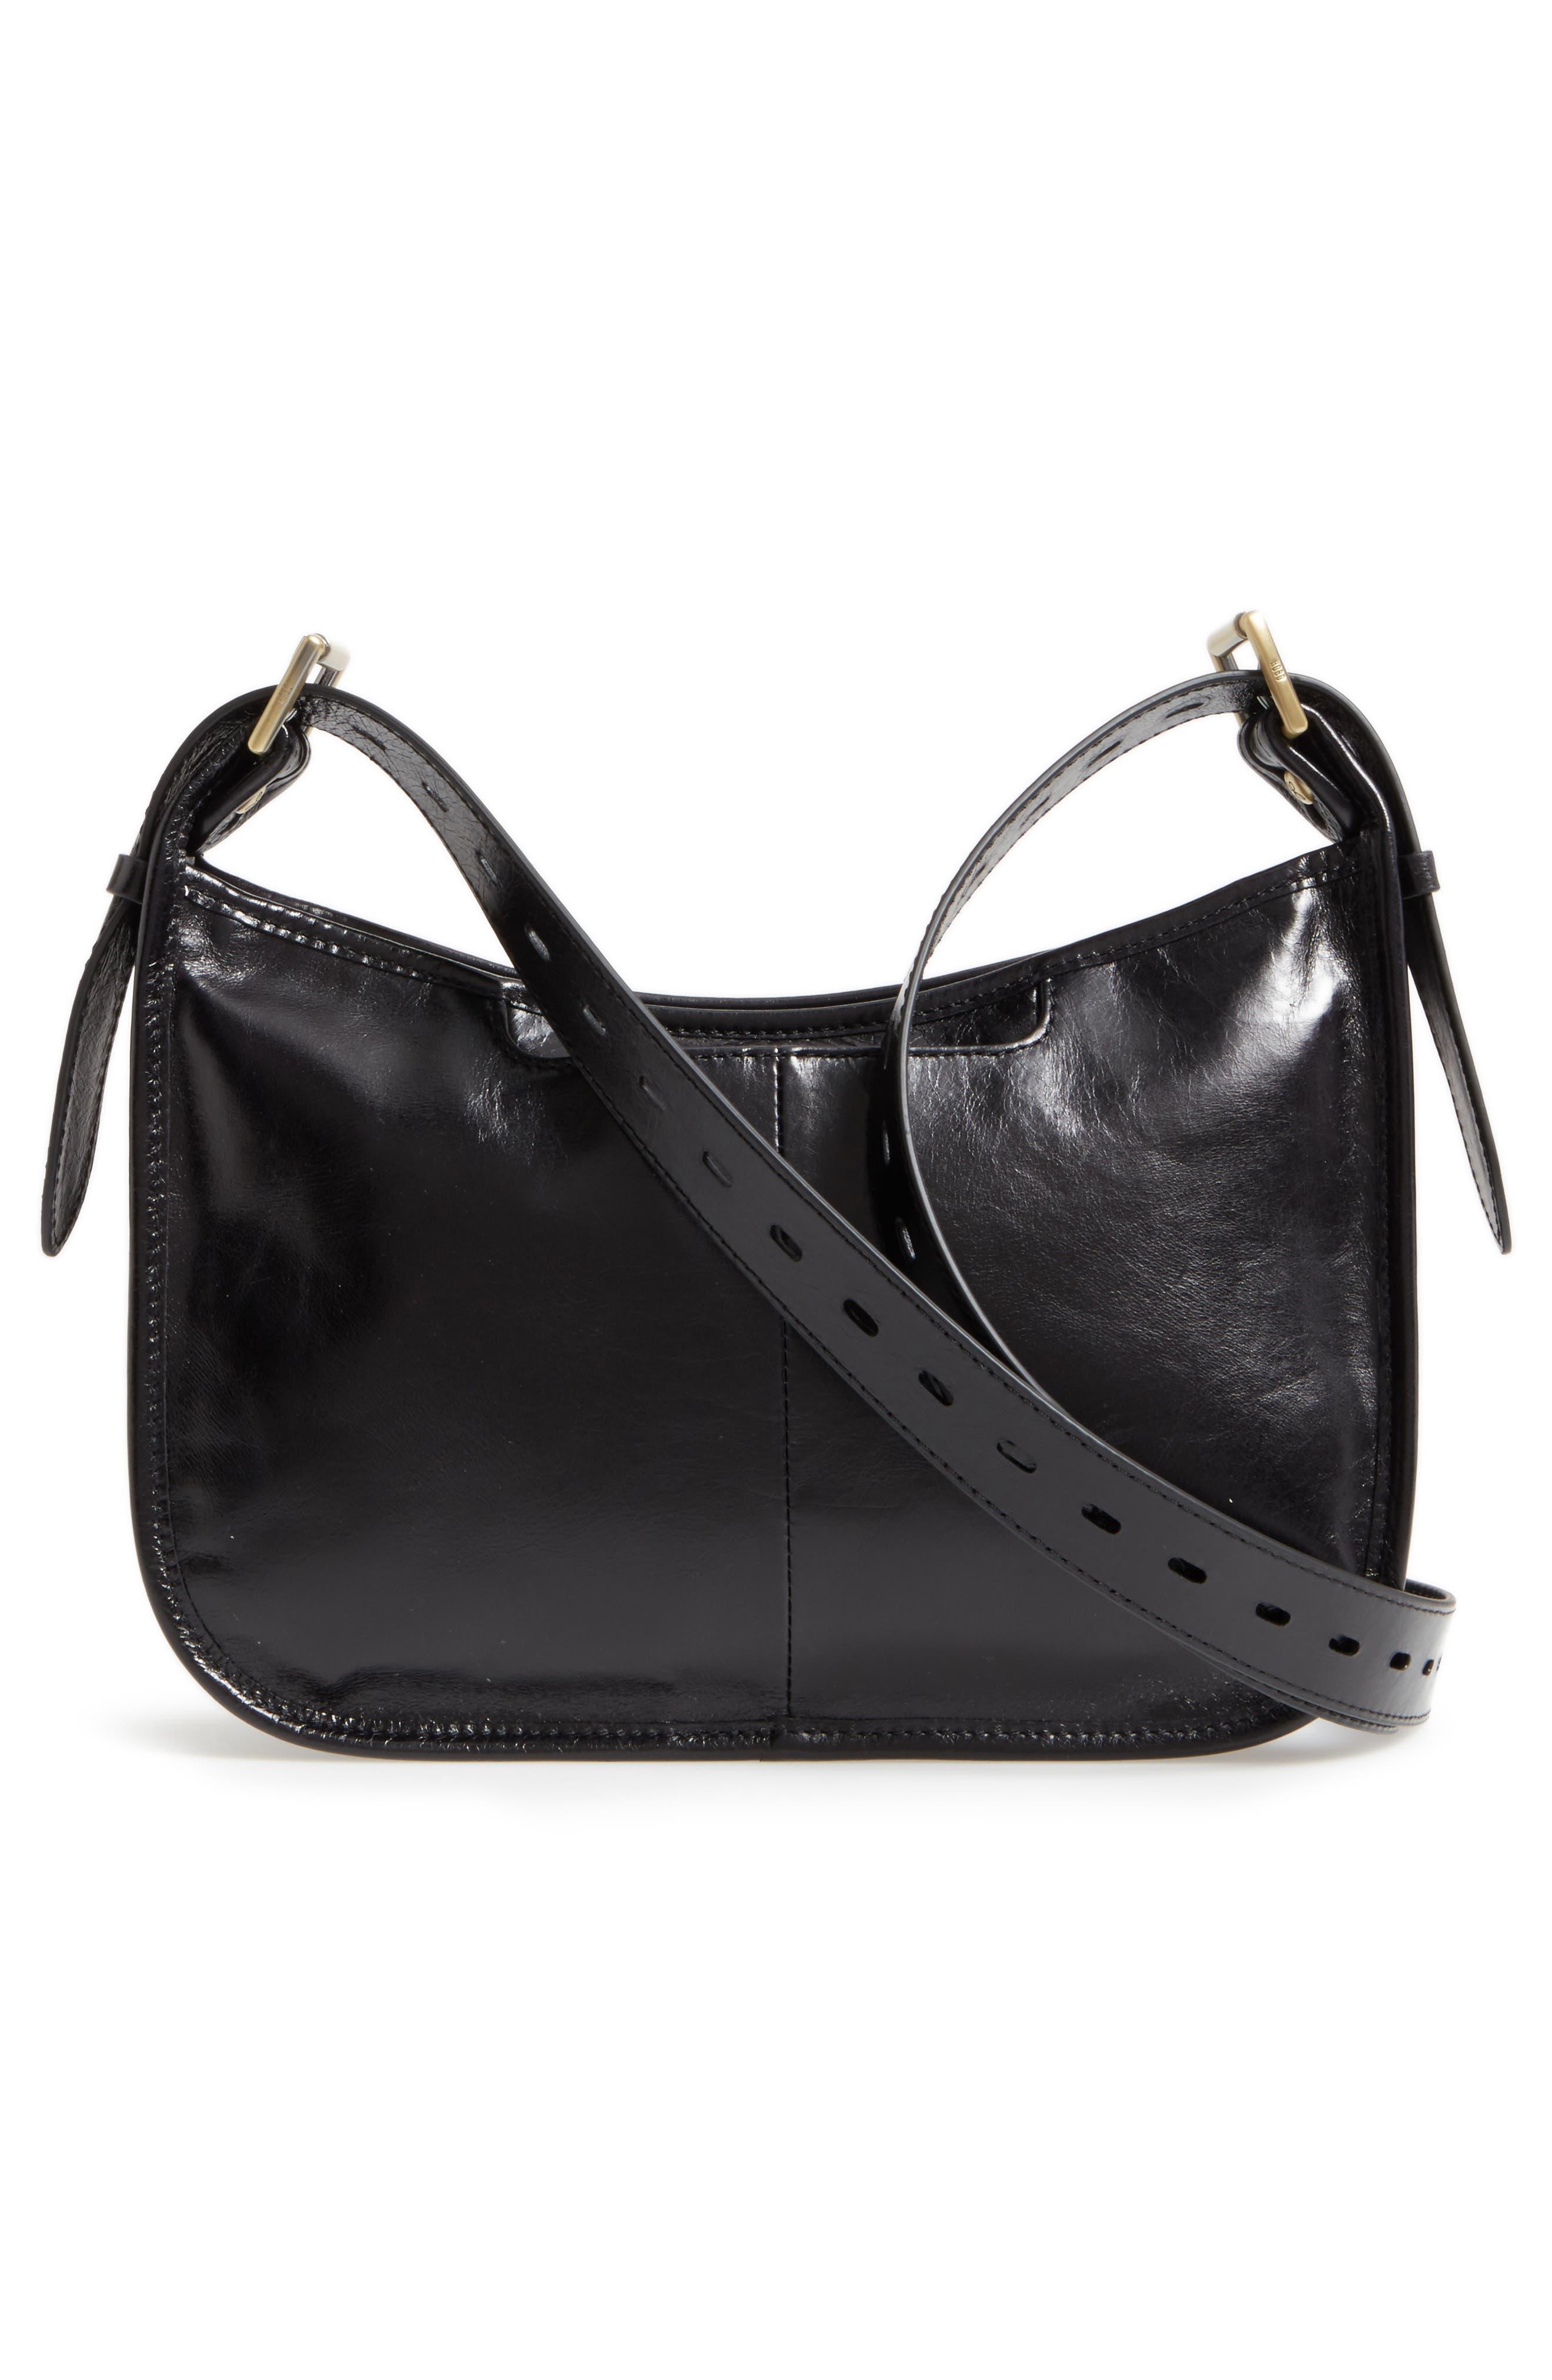 Chase Calfskin Leather Crossbody Bag,                             Alternate thumbnail 2, color,                             Black